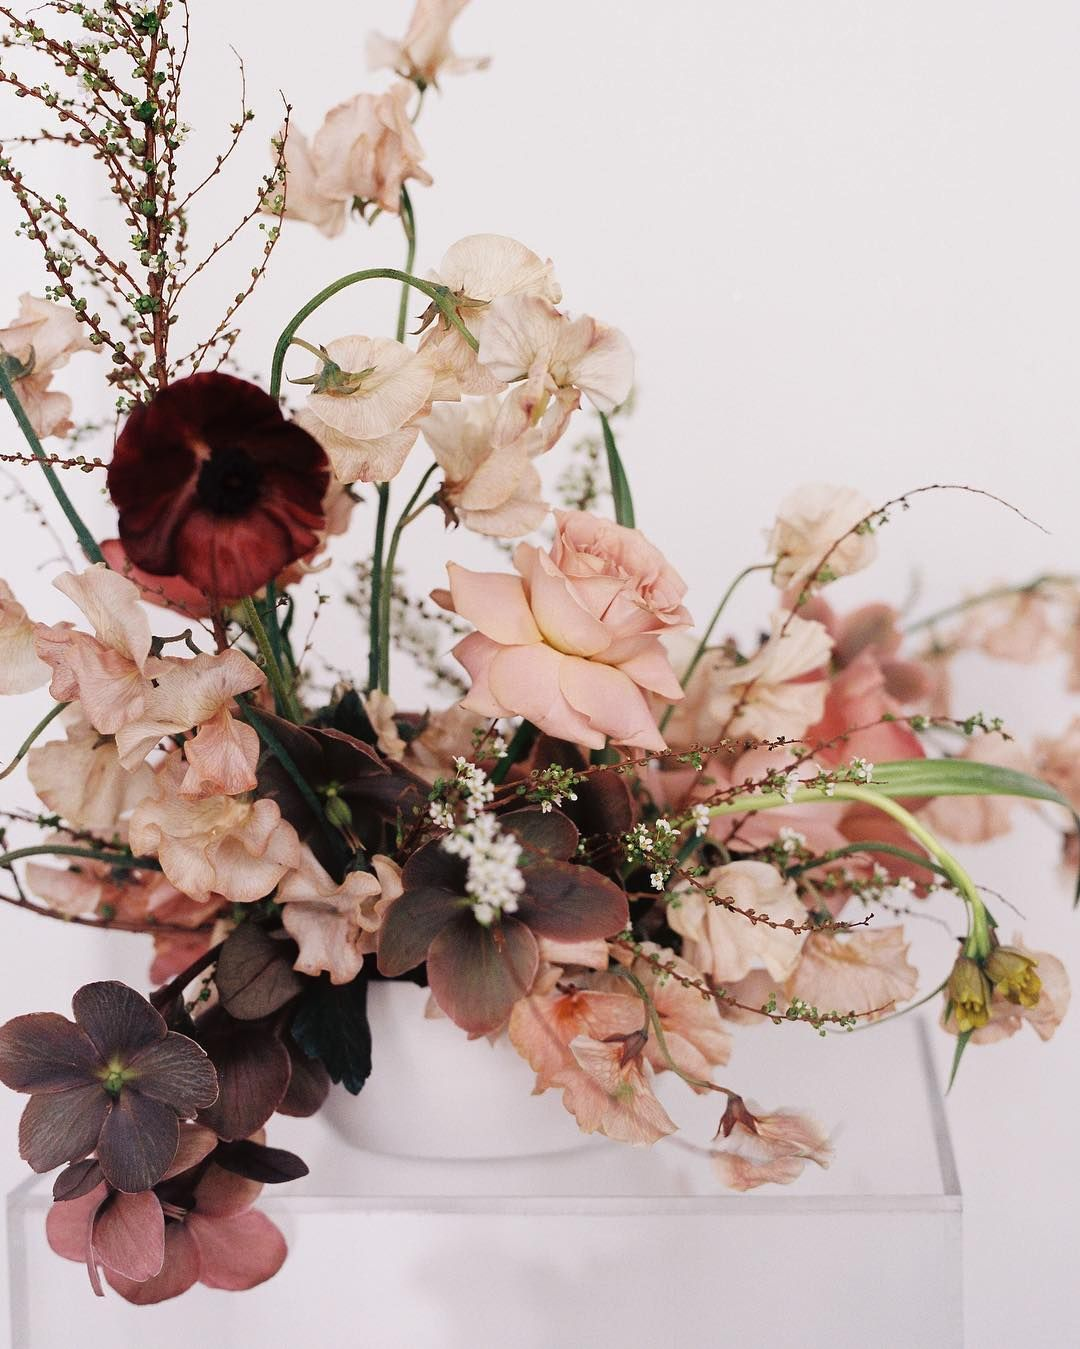 "Ashley Fox Designs On Instagram: """"Emerging Spring"" Theme"